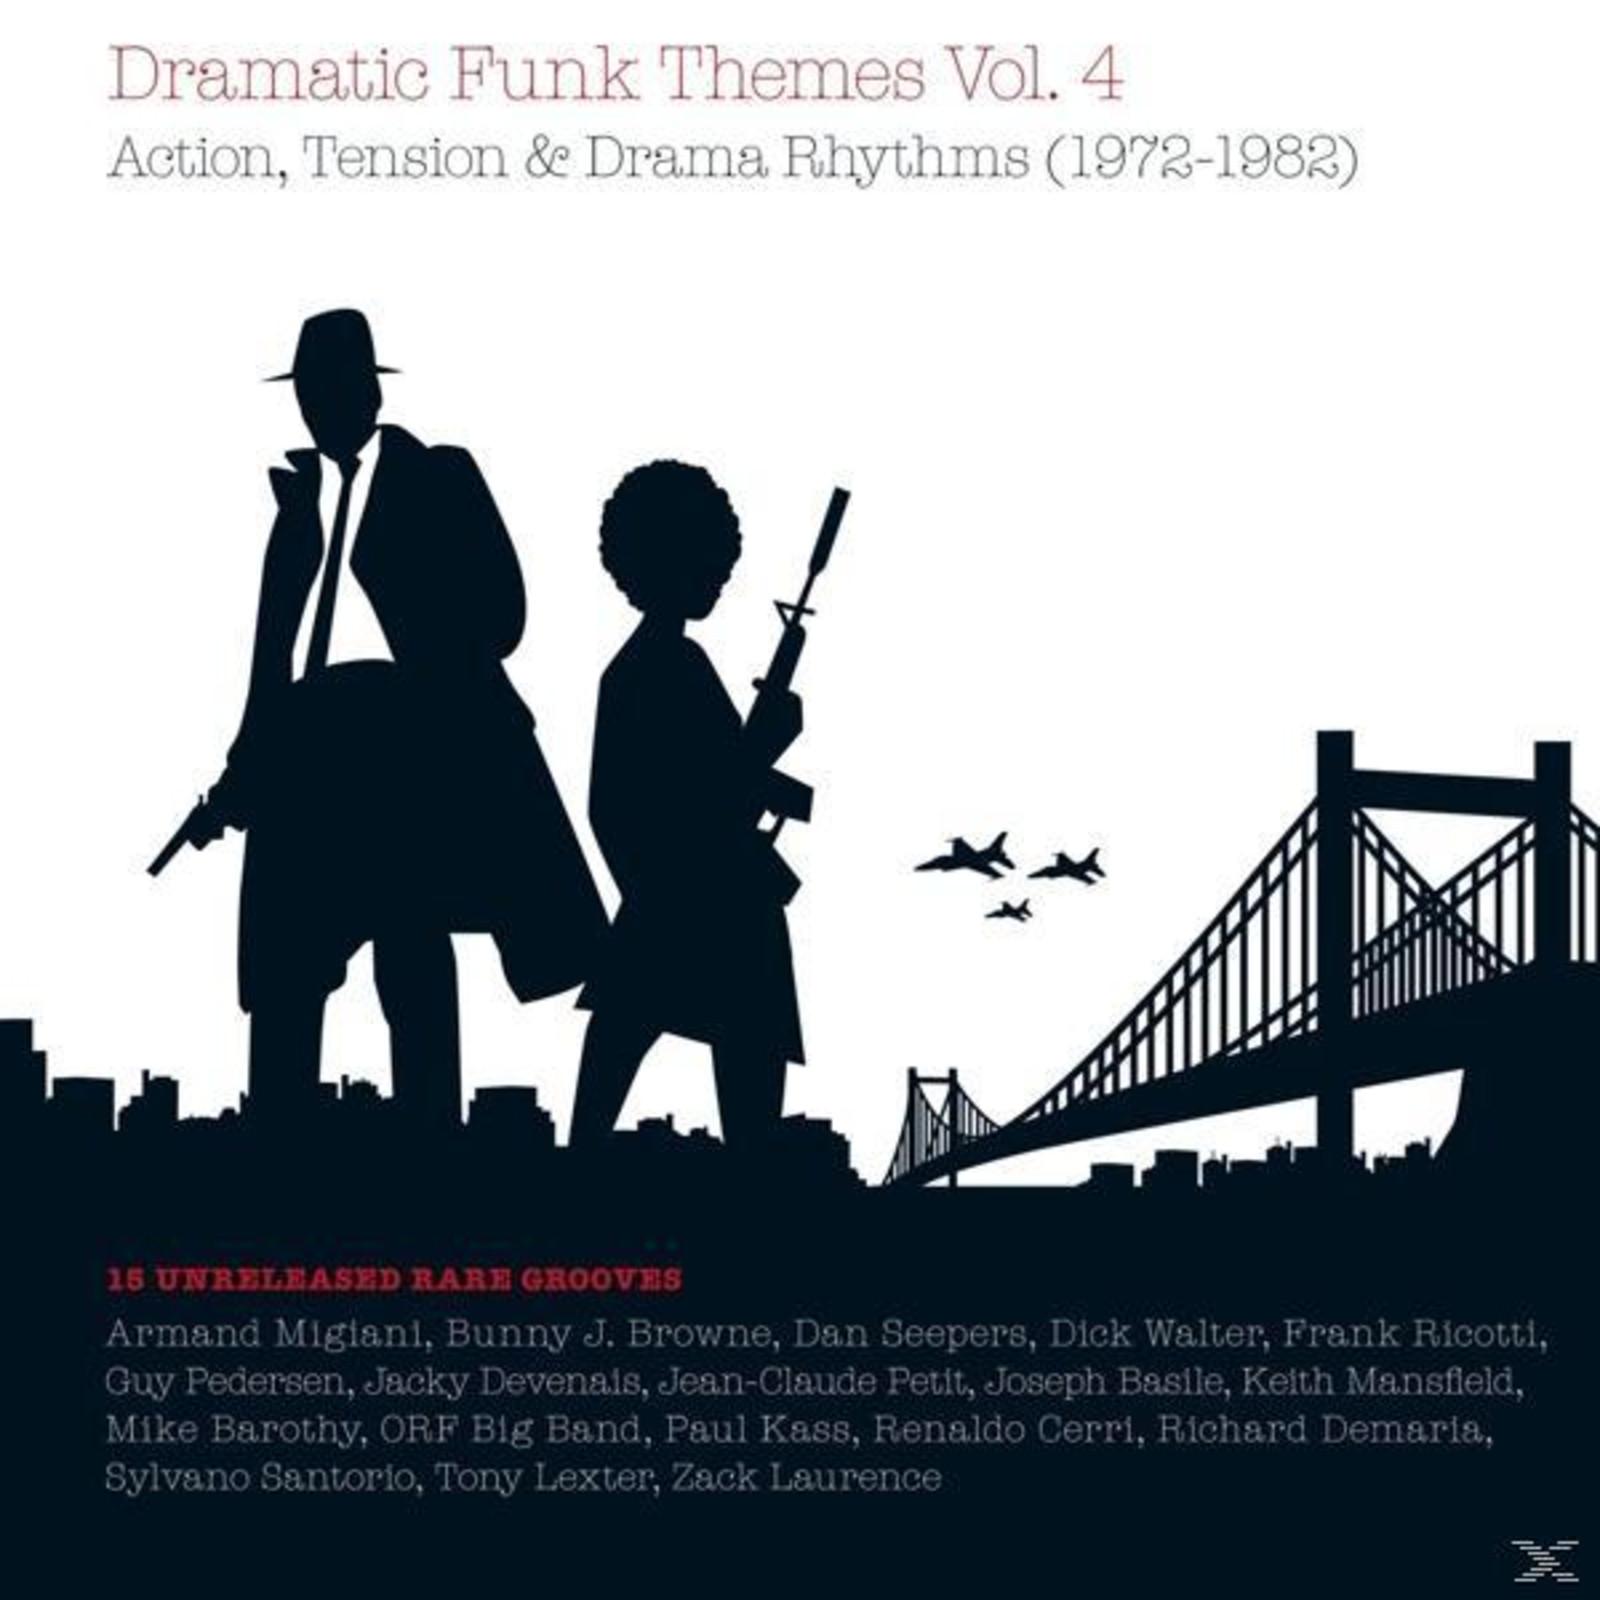 VARIOUS - Dramatic Funk Themes # 4 [Vinyl]